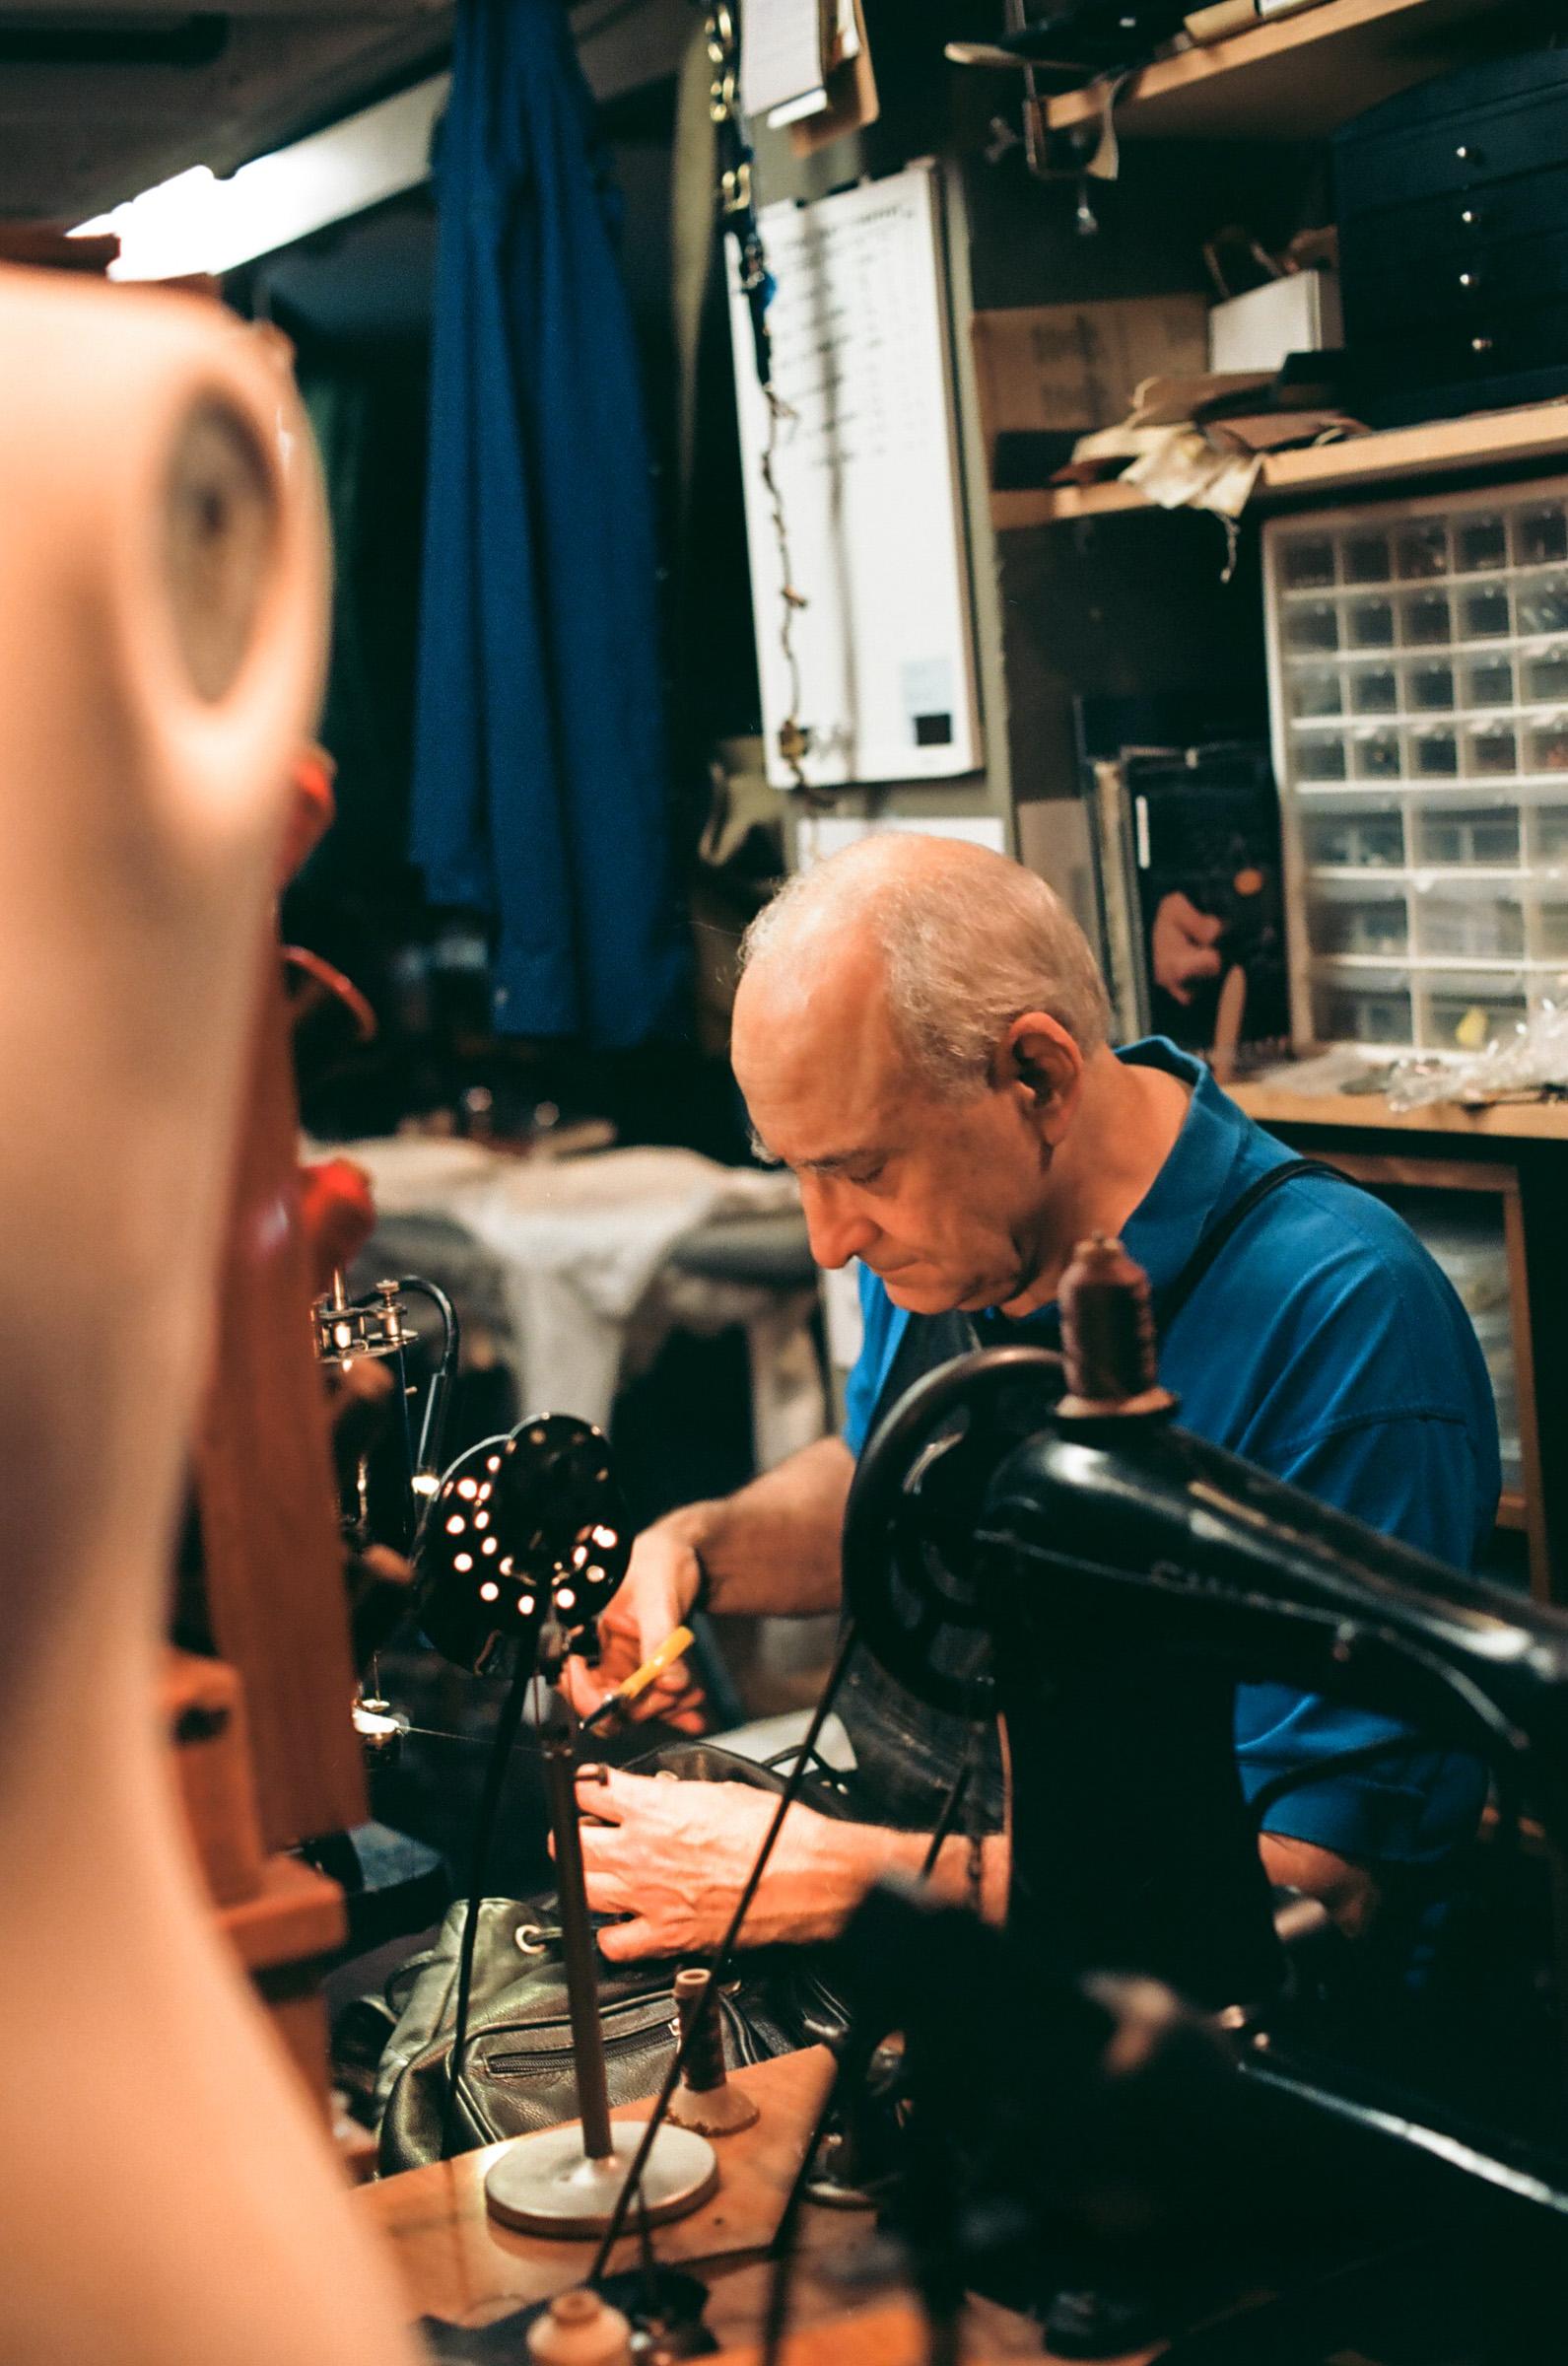 Tailor tailoring at Al's Attire.